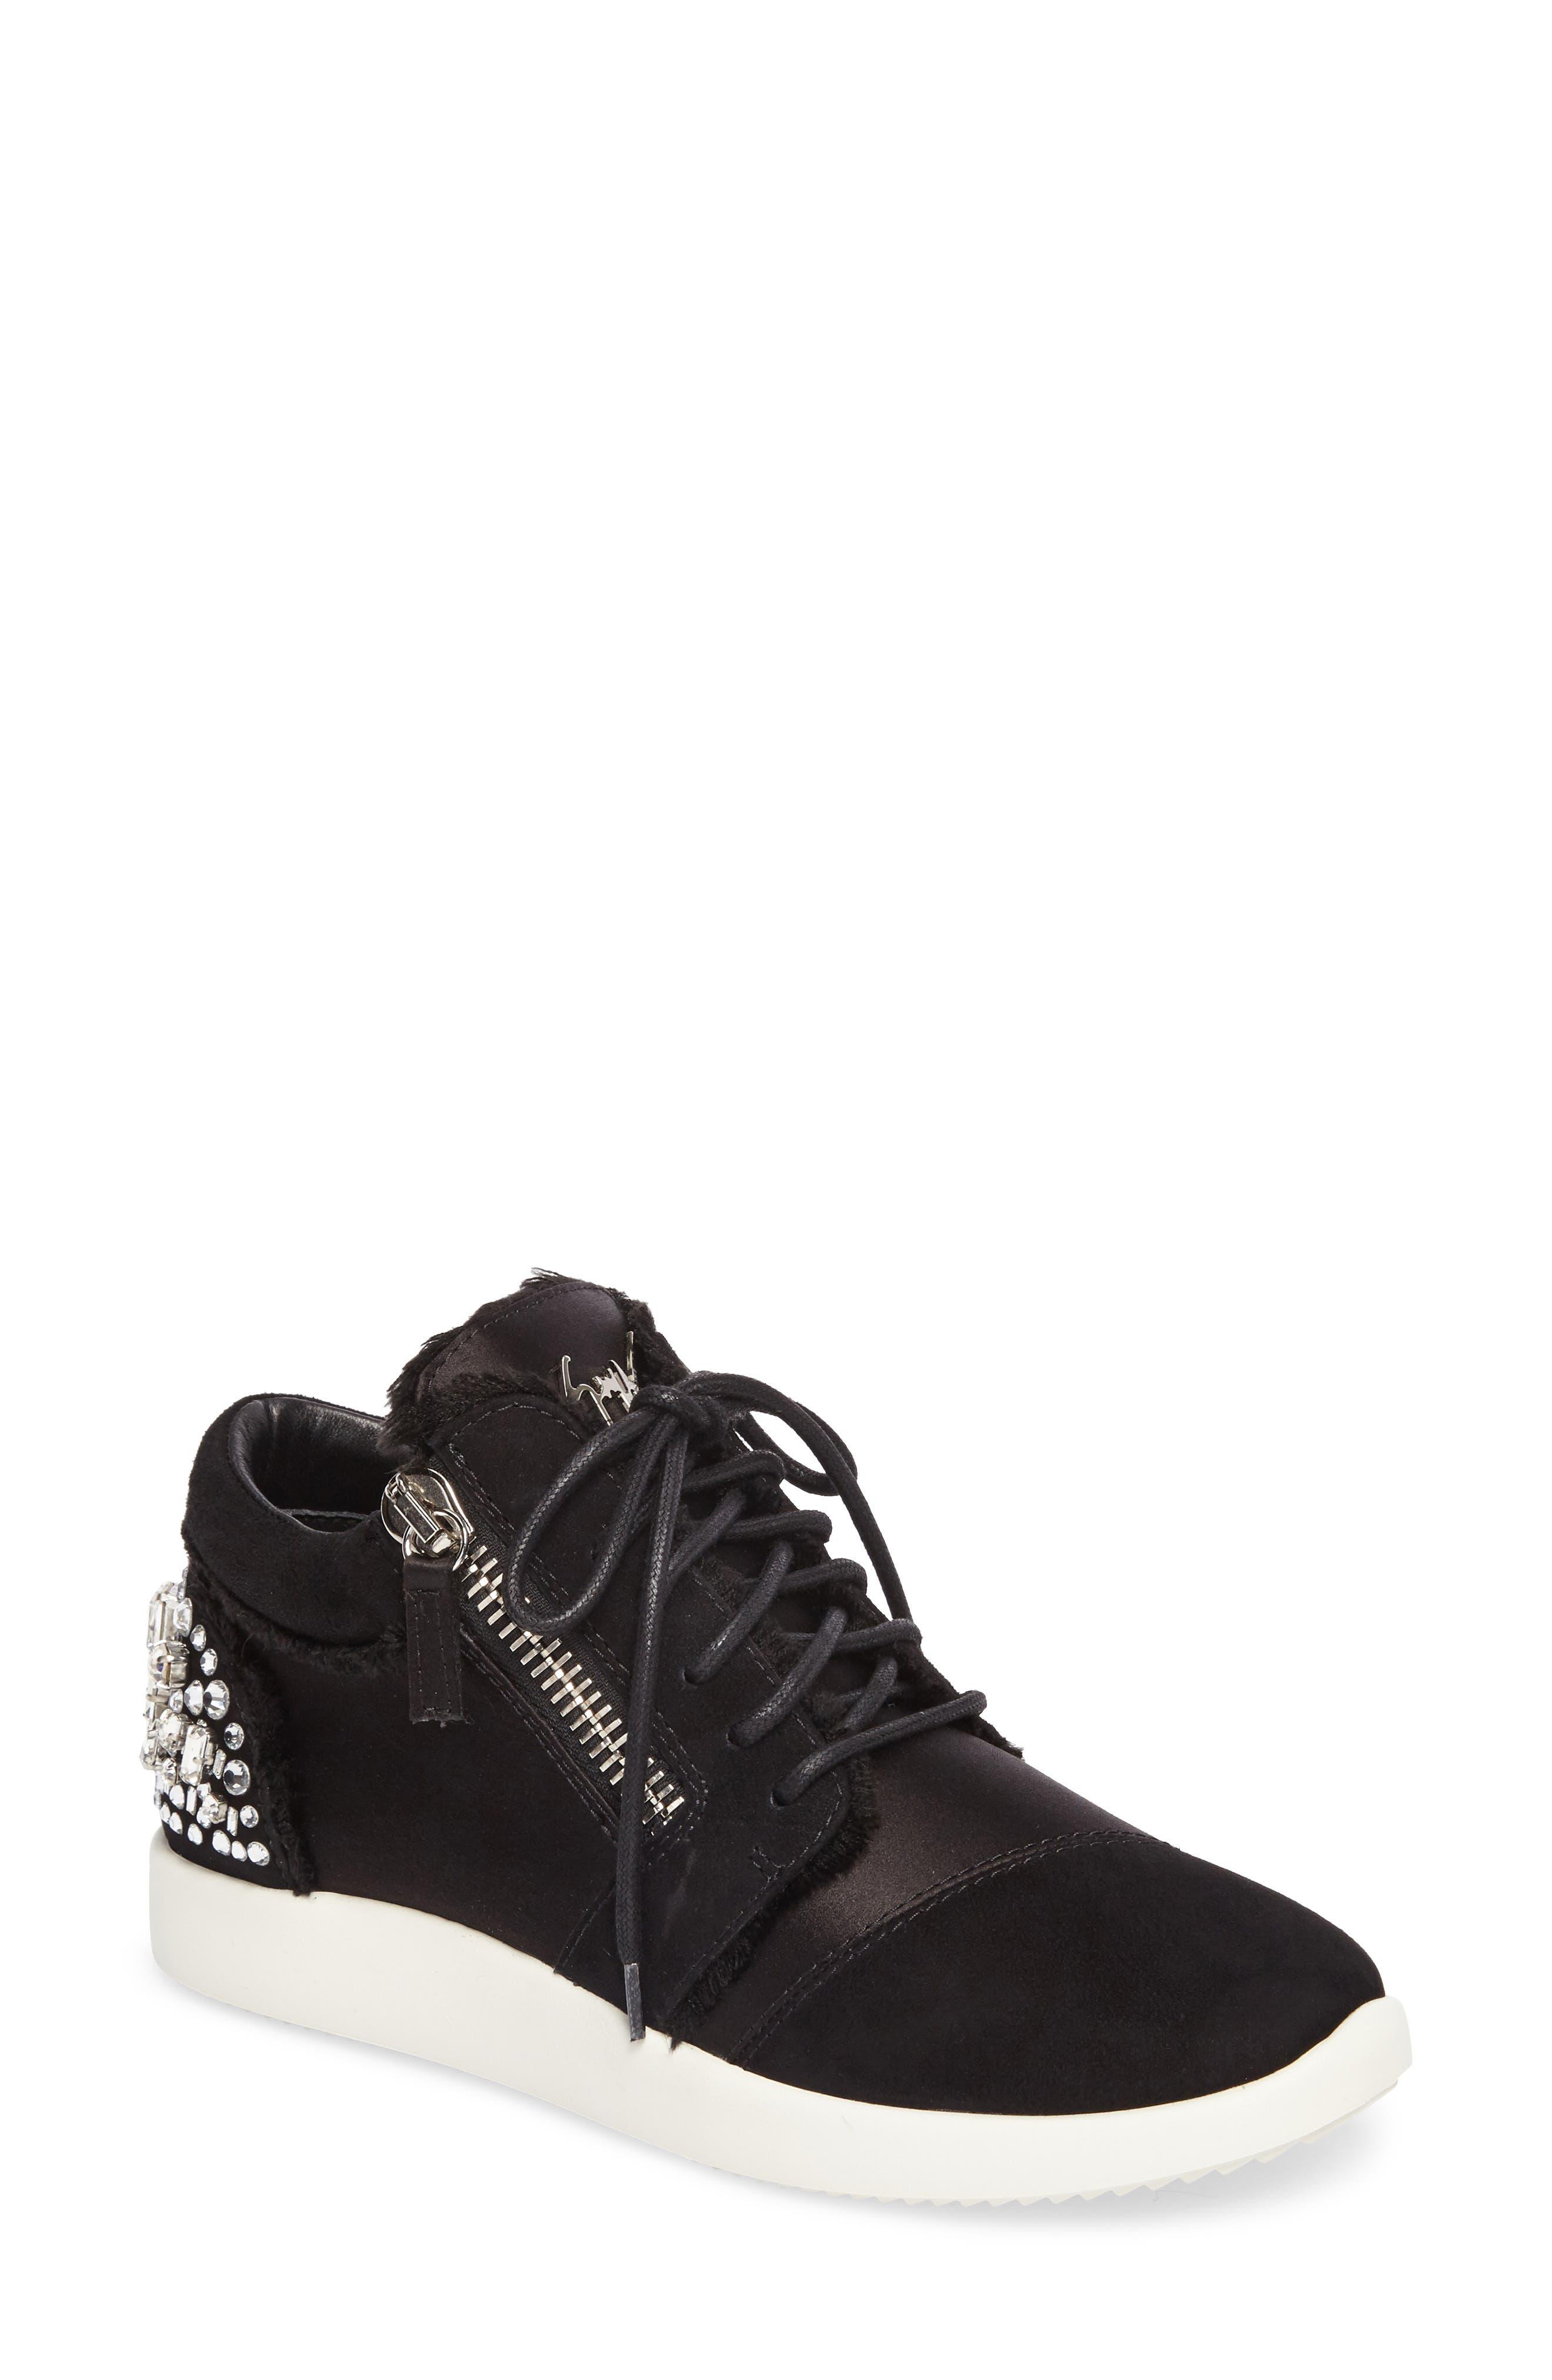 Alternate Image 1 Selected - Giuseppe Zanotti Swarovski Crystal Embellished Sneaker (Women)